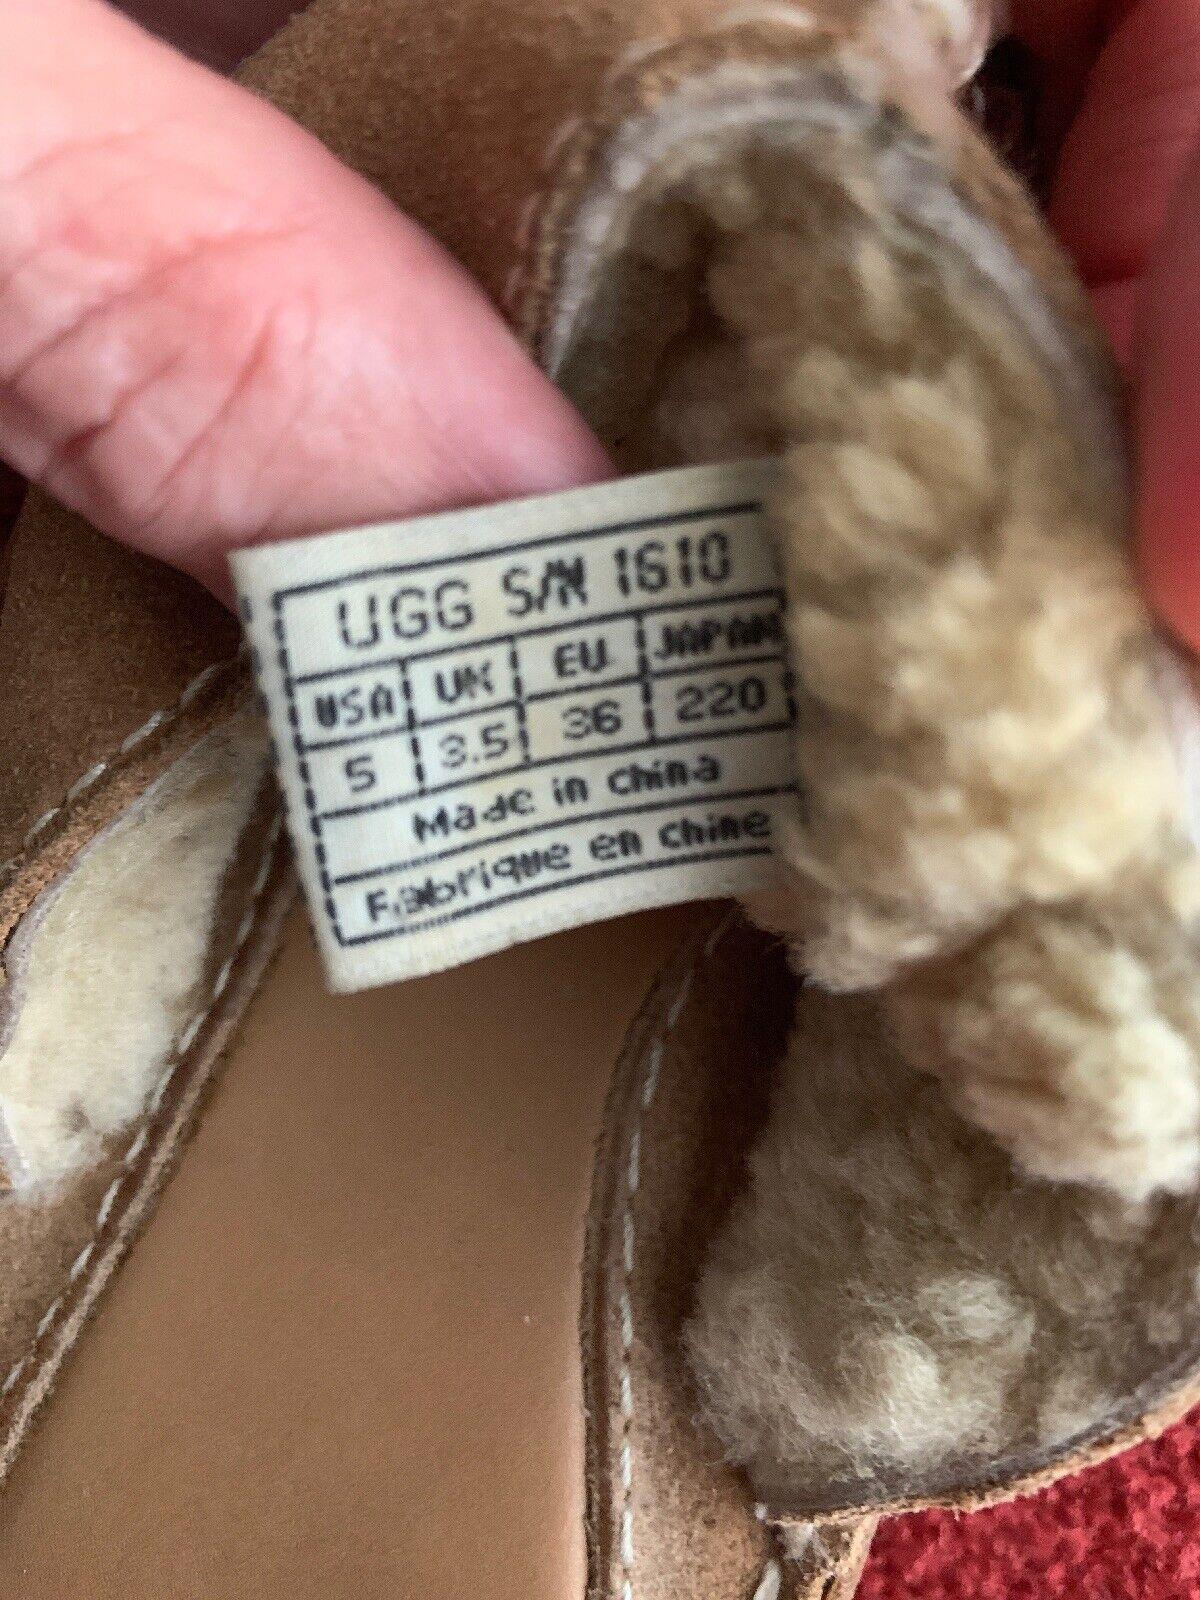 UGG Sandal - image 3